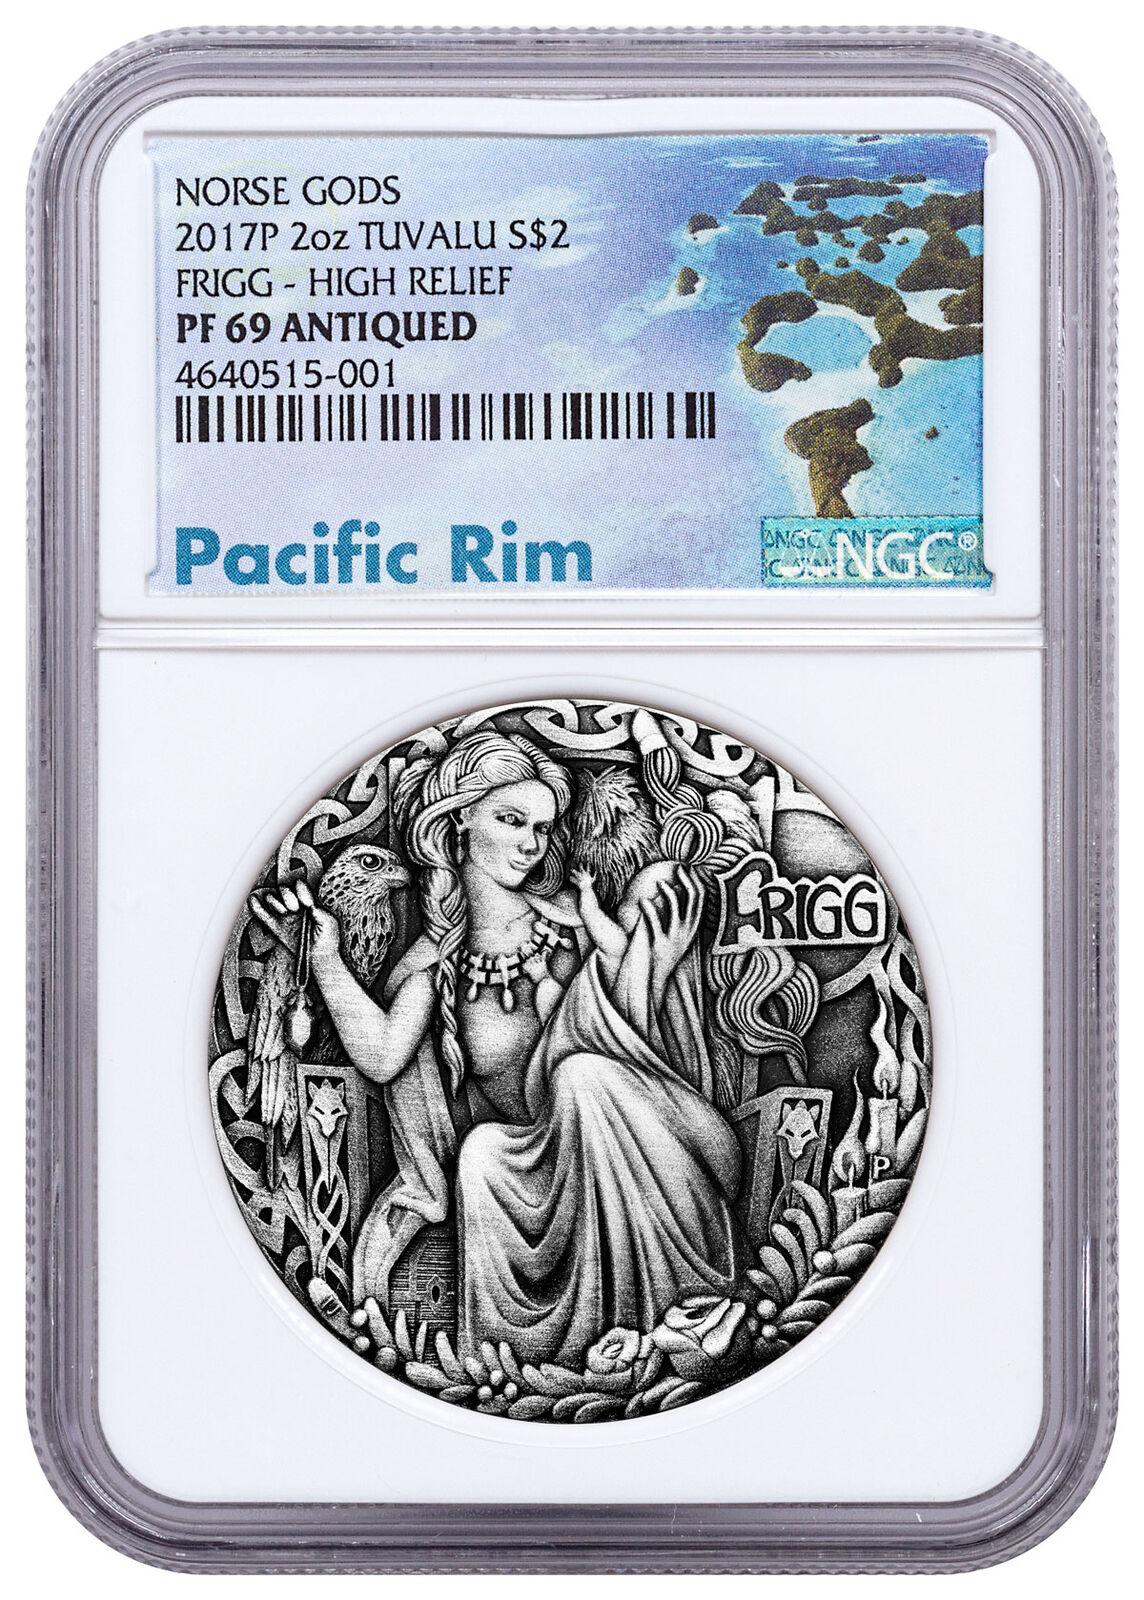 2017-p tuvalu norse goddesses frigg hr 2 oz silver antiqued $2 ngc pf69 sku51538